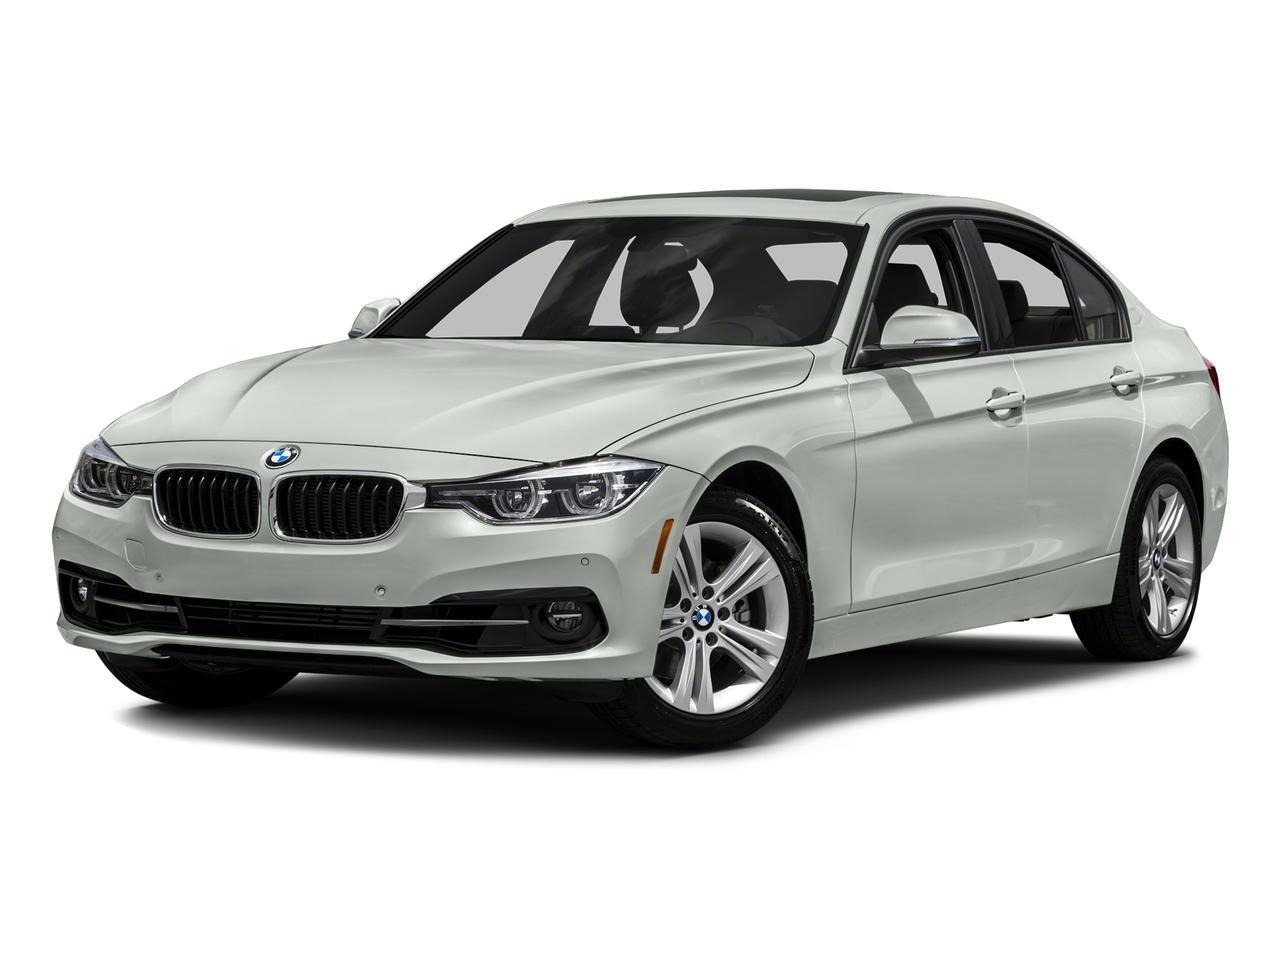 2017 BMW 330i Vehicle Photo in Pleasanton, CA 94588